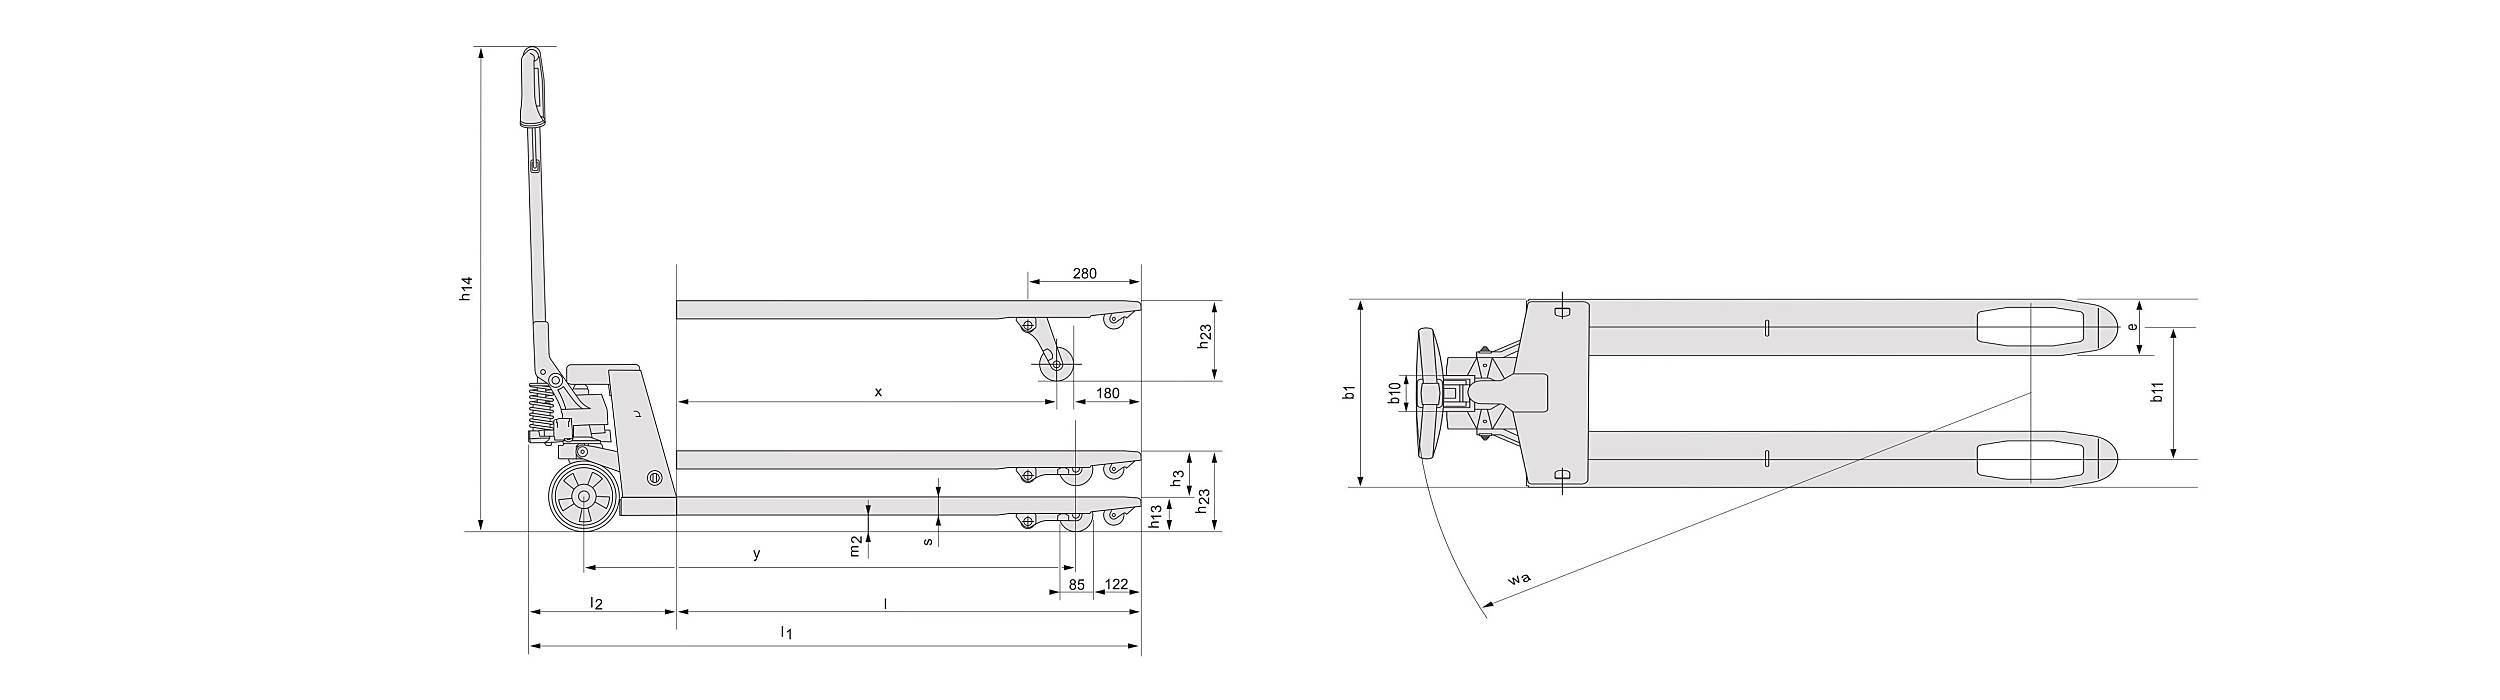 estrutura e sistema porta paletes manual